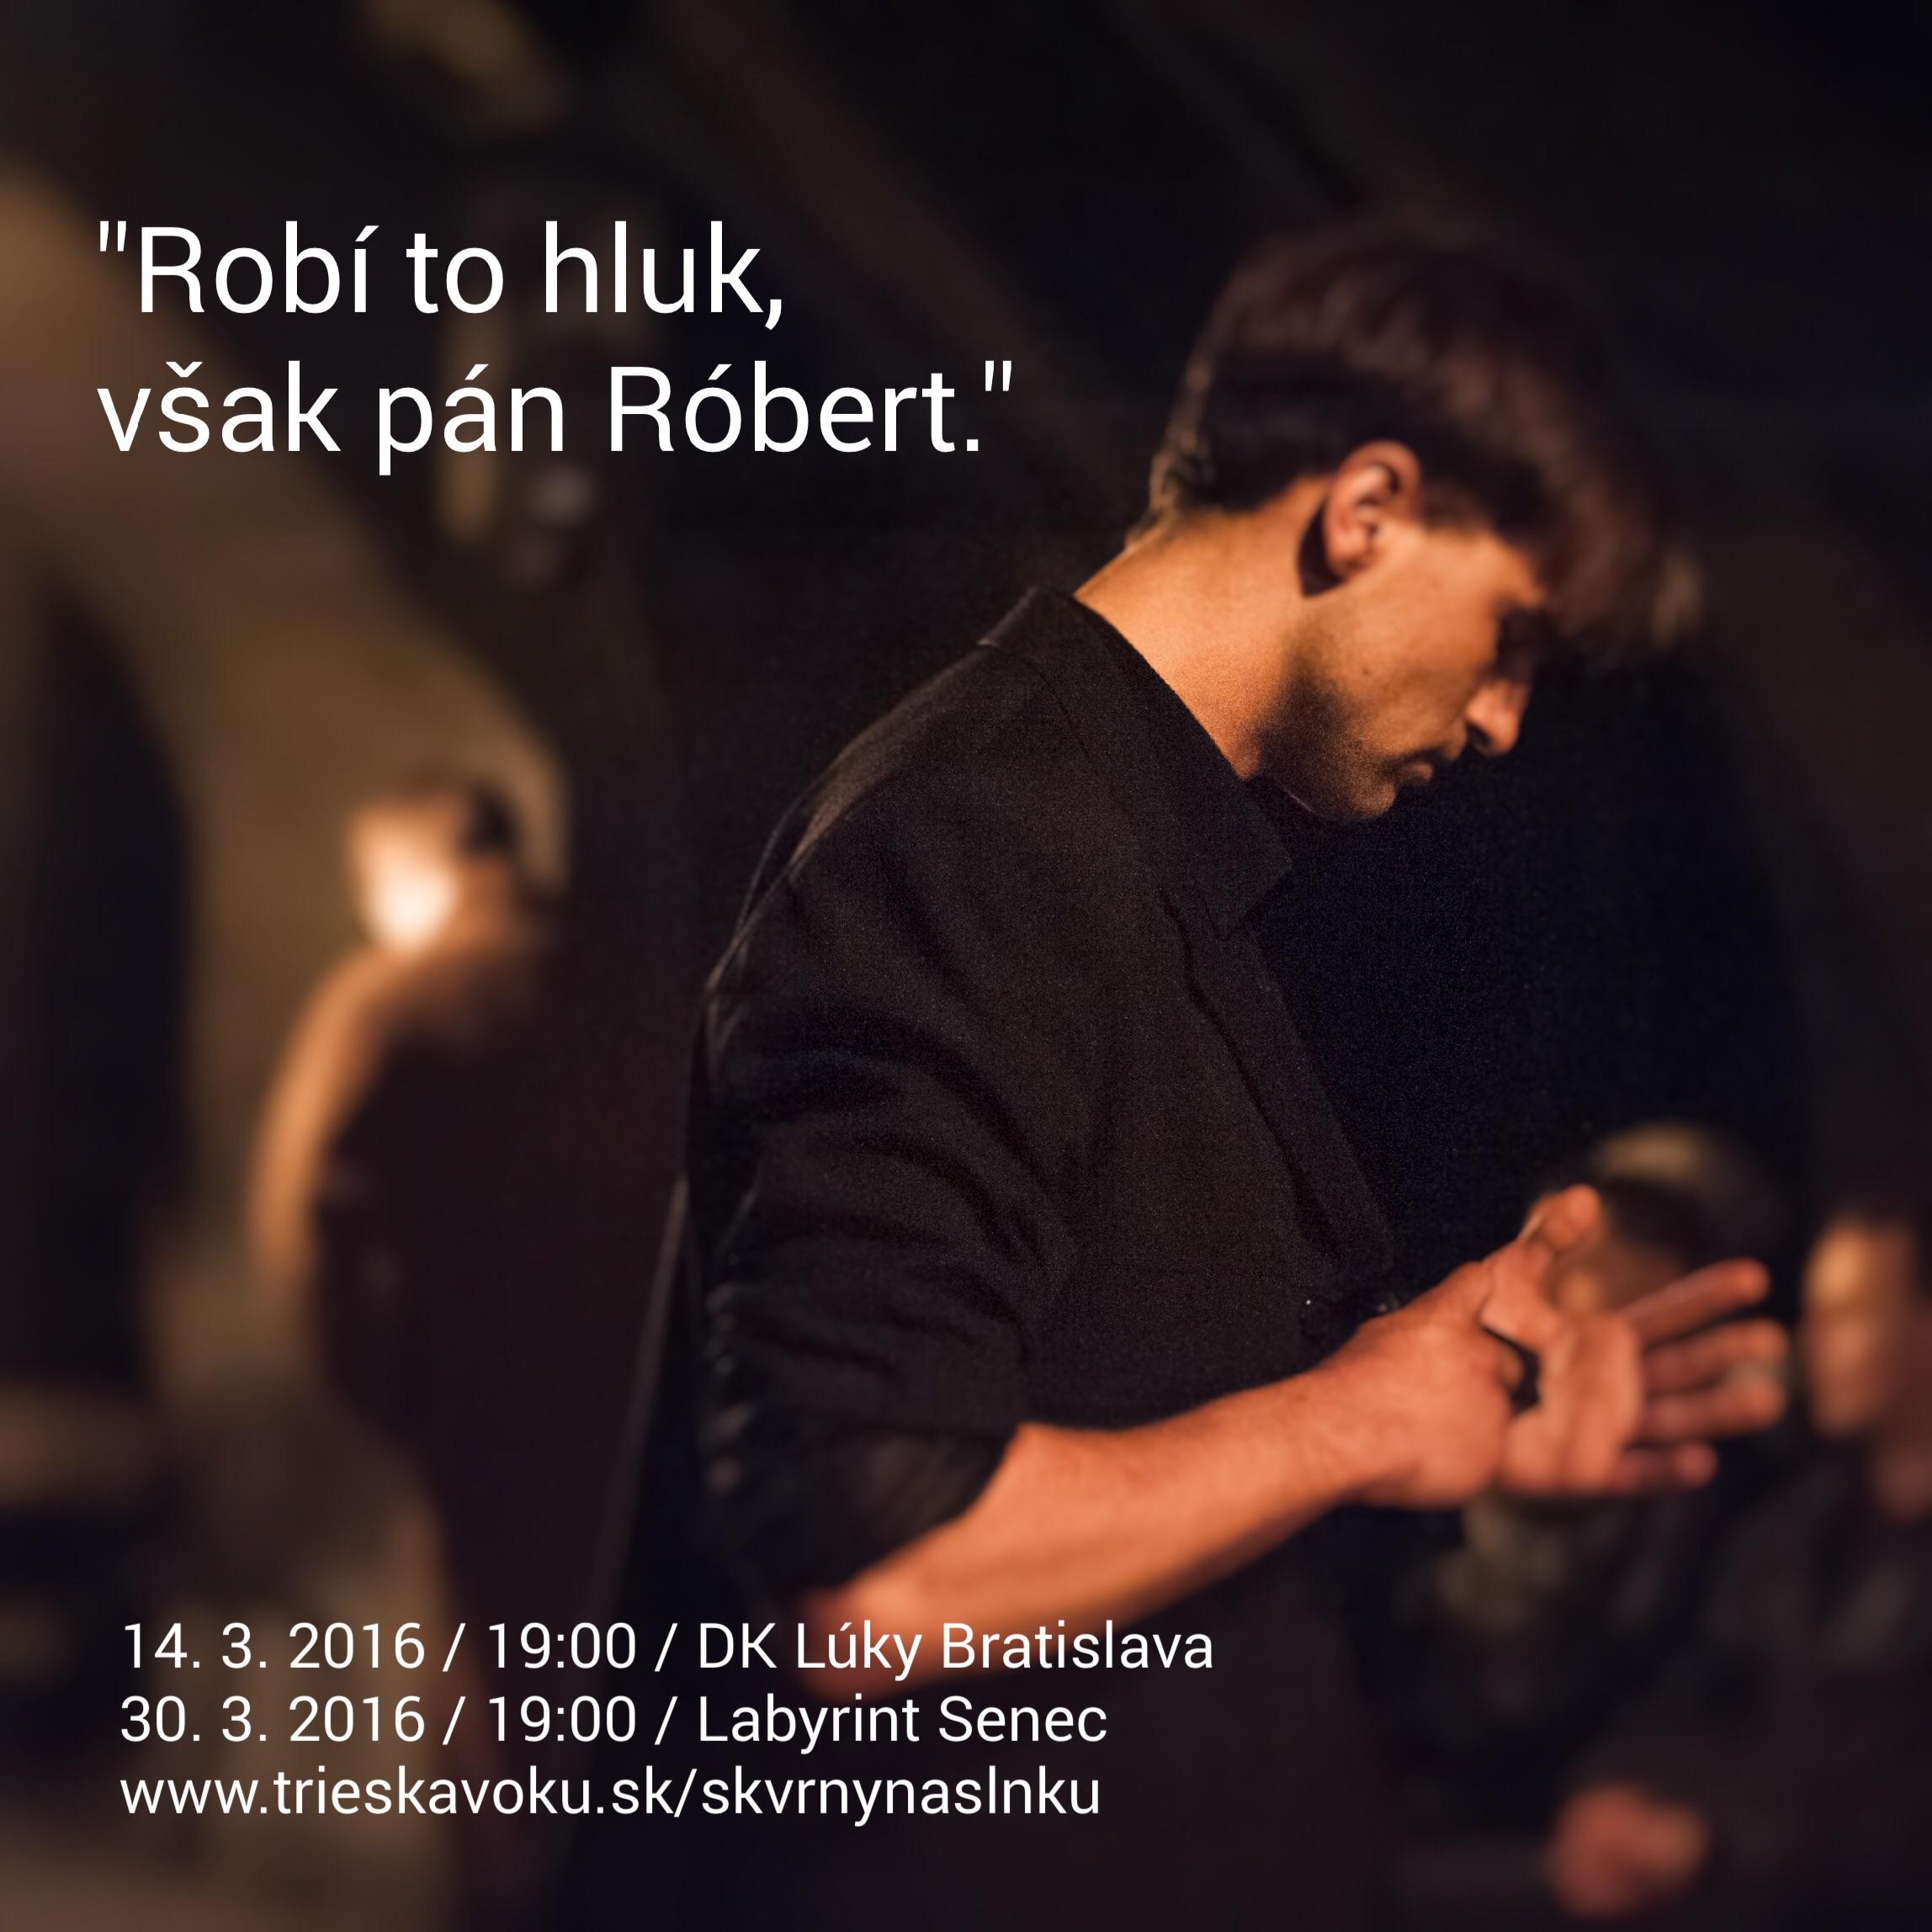 http://www.facebook.com/skvrnynaslnku